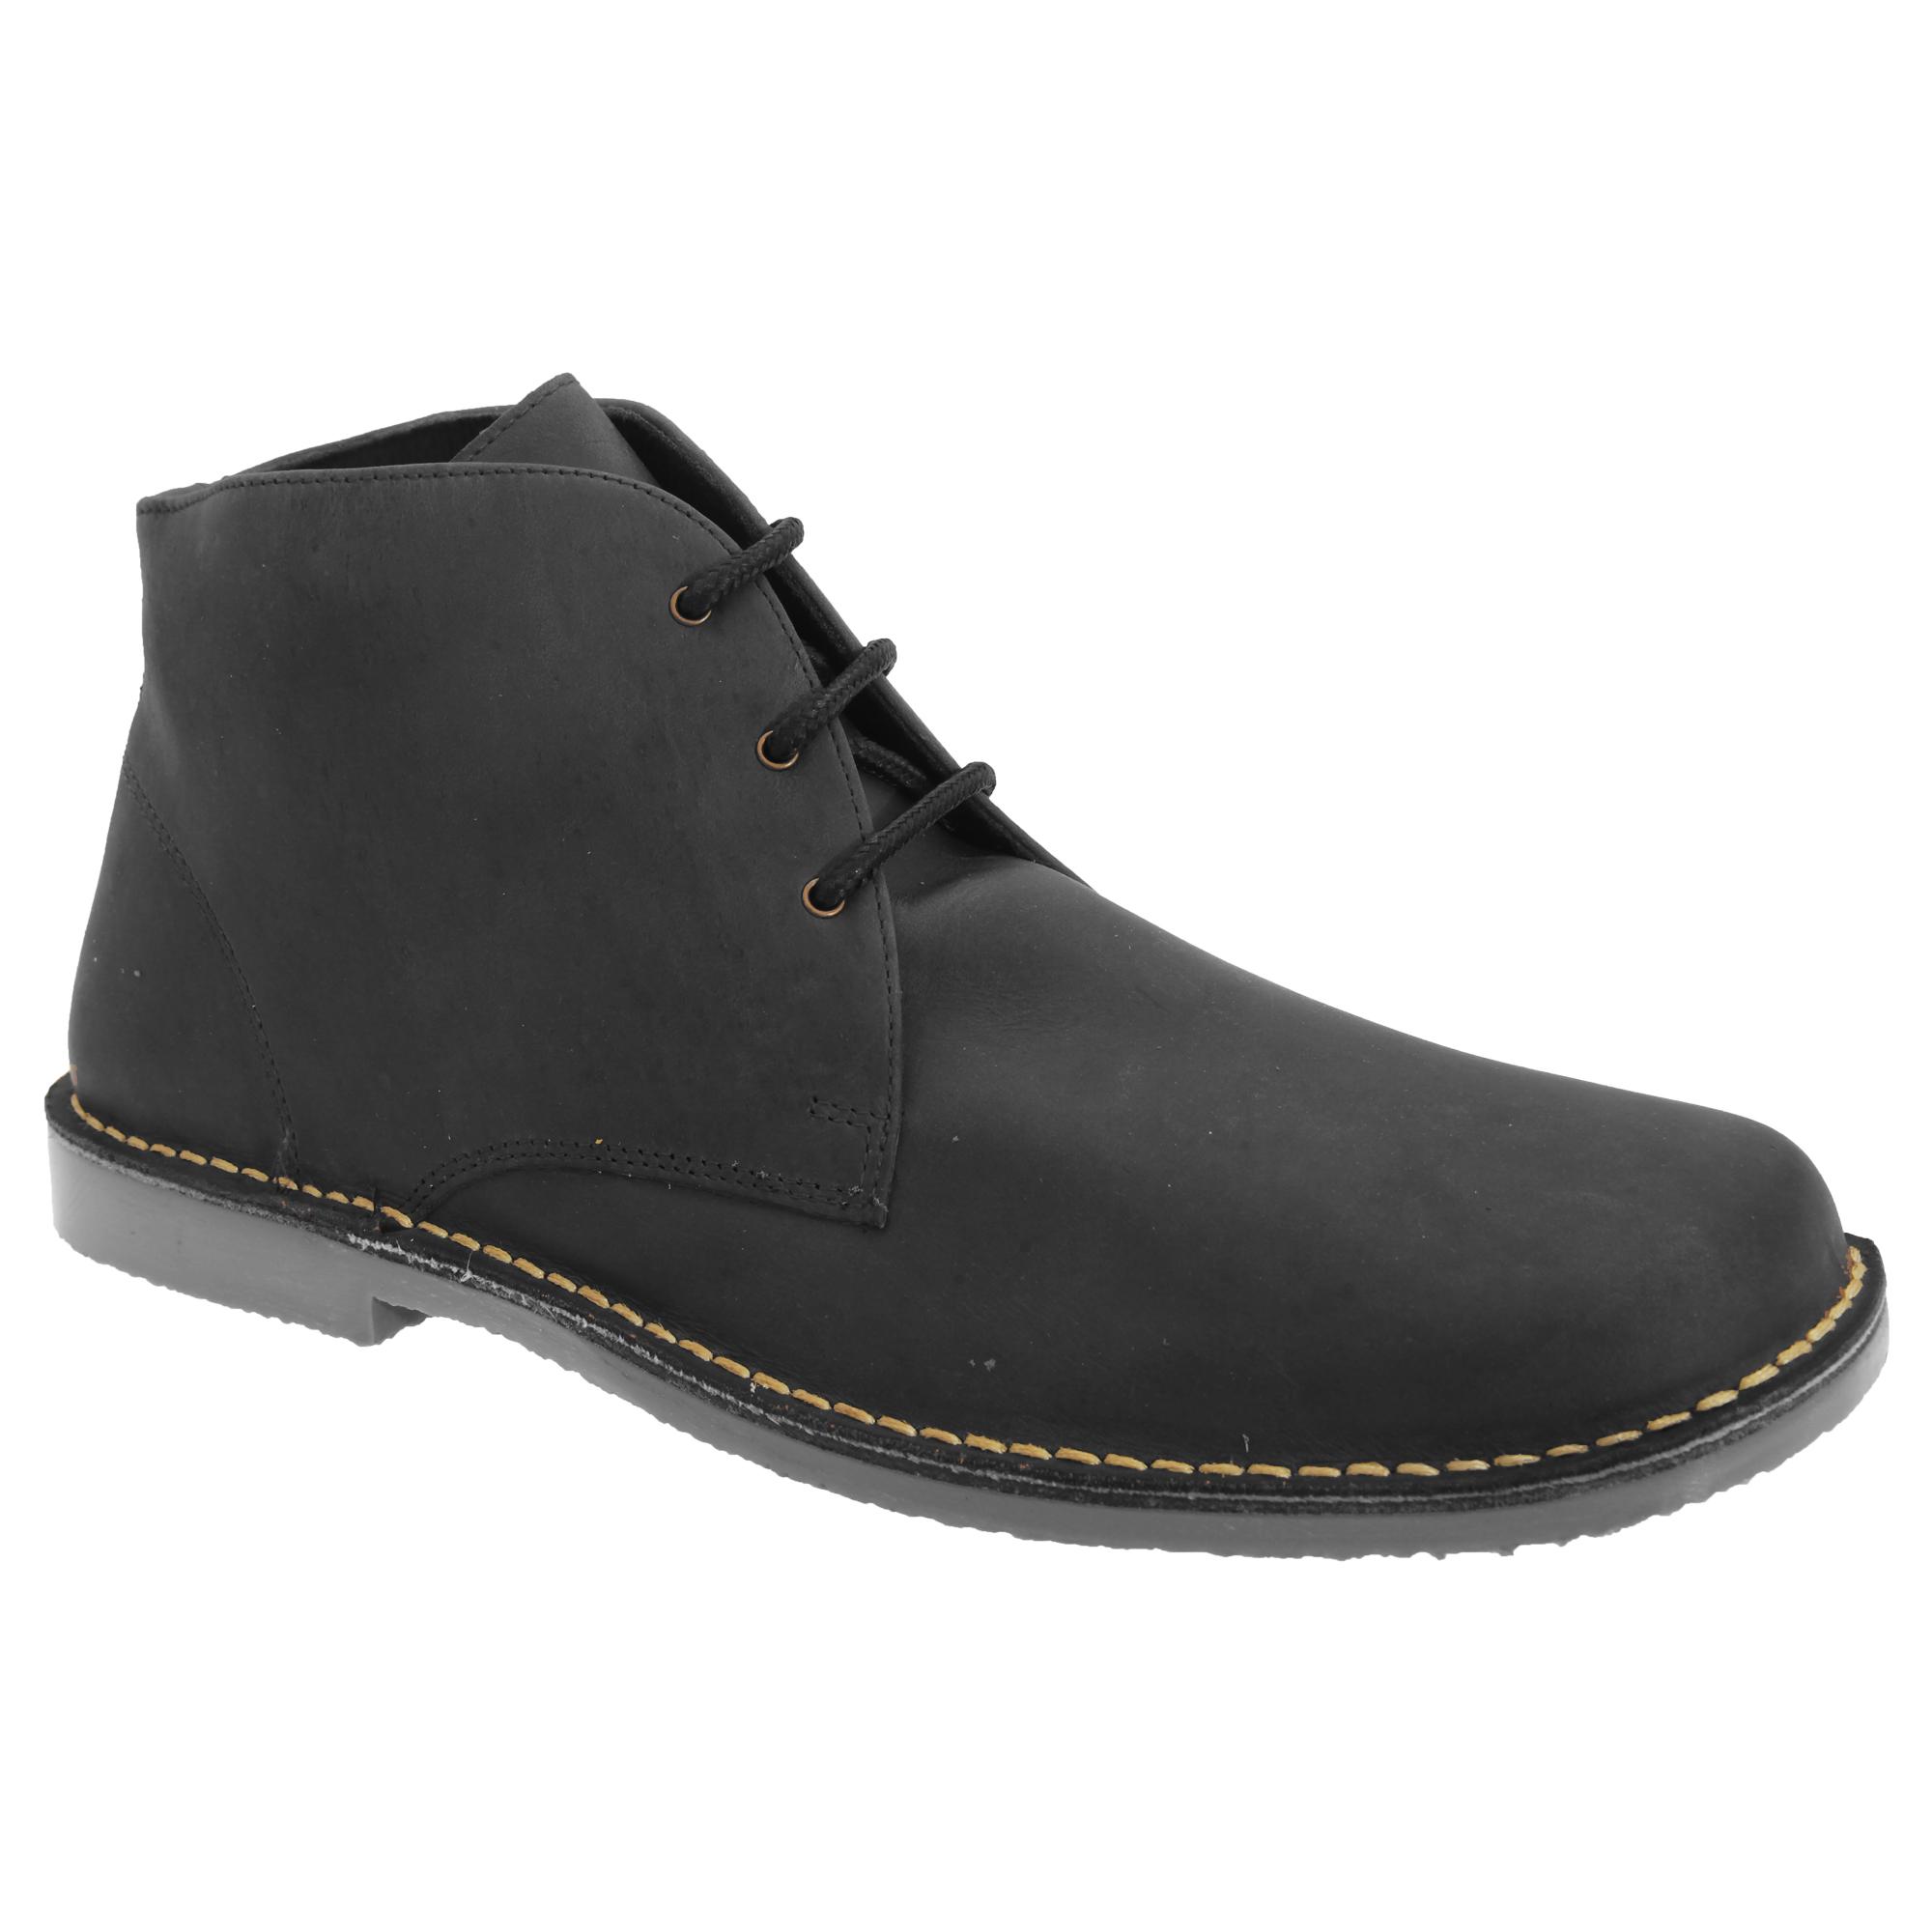 Roamers Mens Waxy Leather Fulfit Desert Boots (13 UK) (Brown)